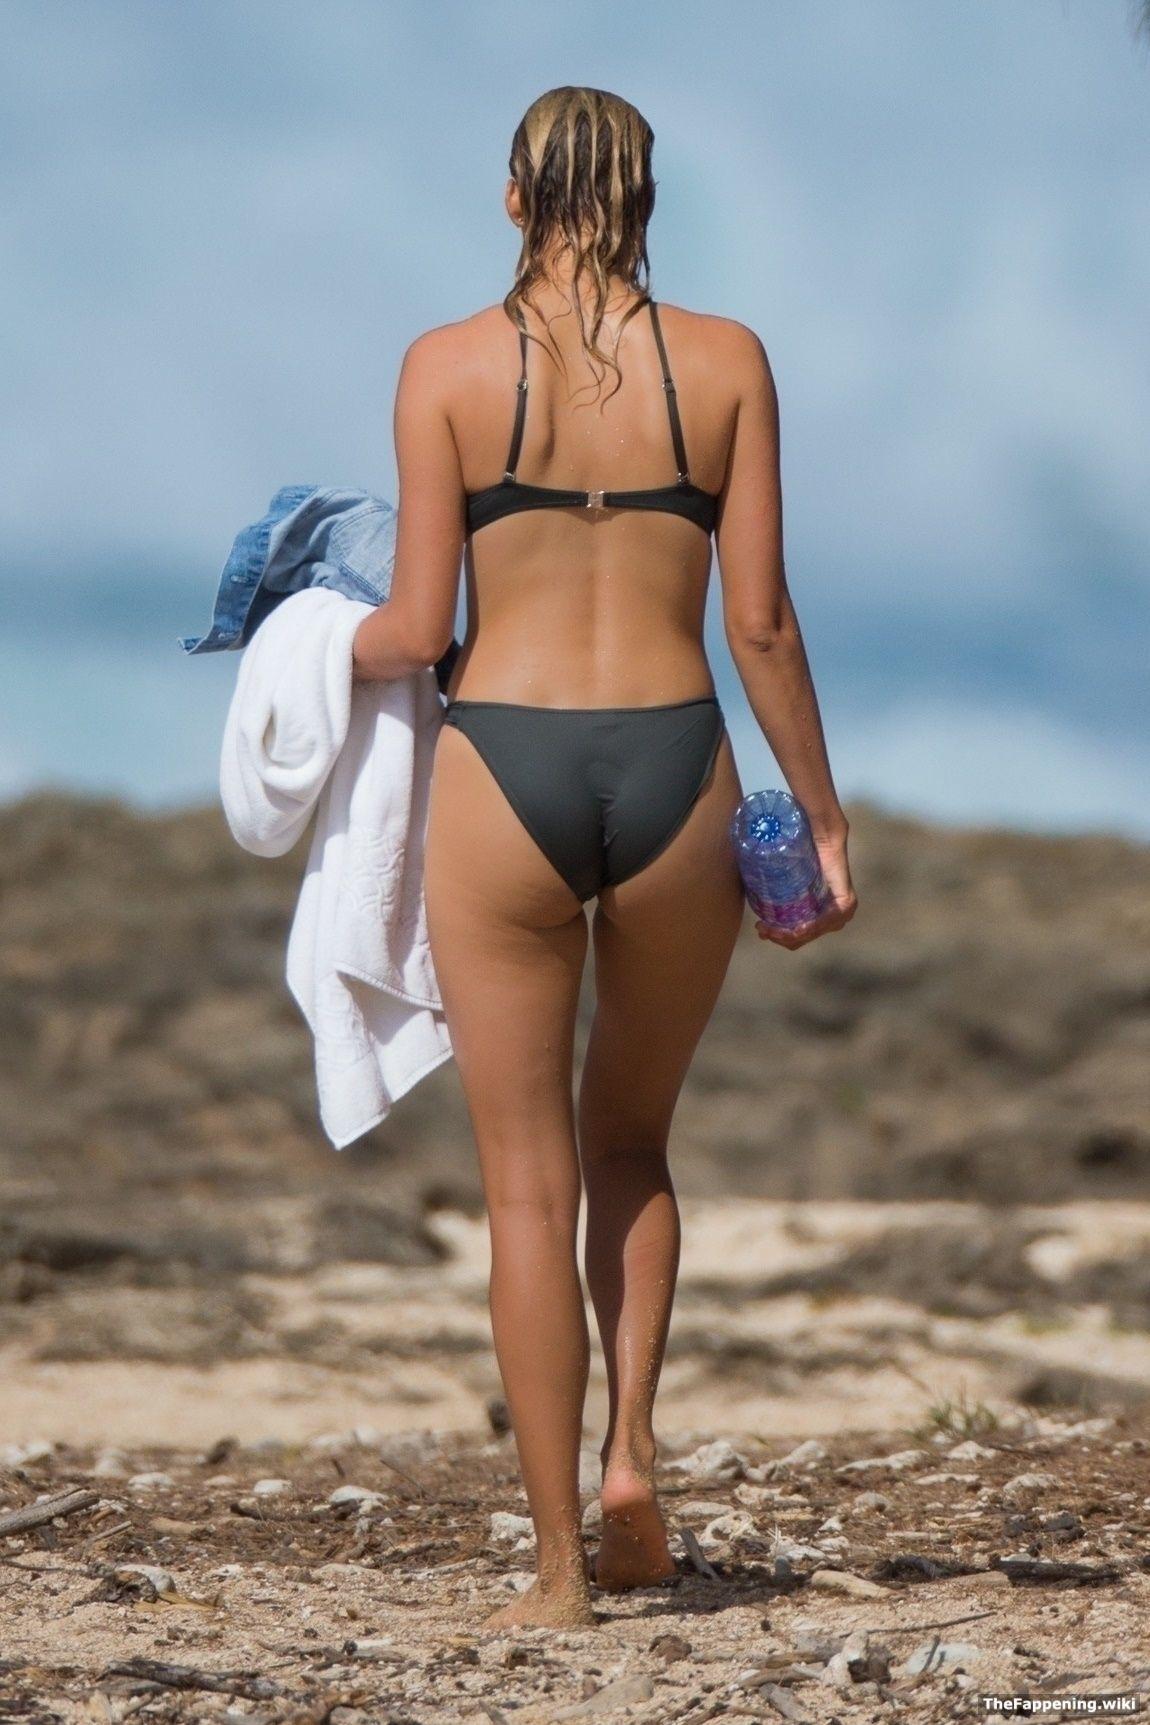 XXX Kelly Rohrbach naked (55 photos), Ass, Leaked, Instagram, panties 2020